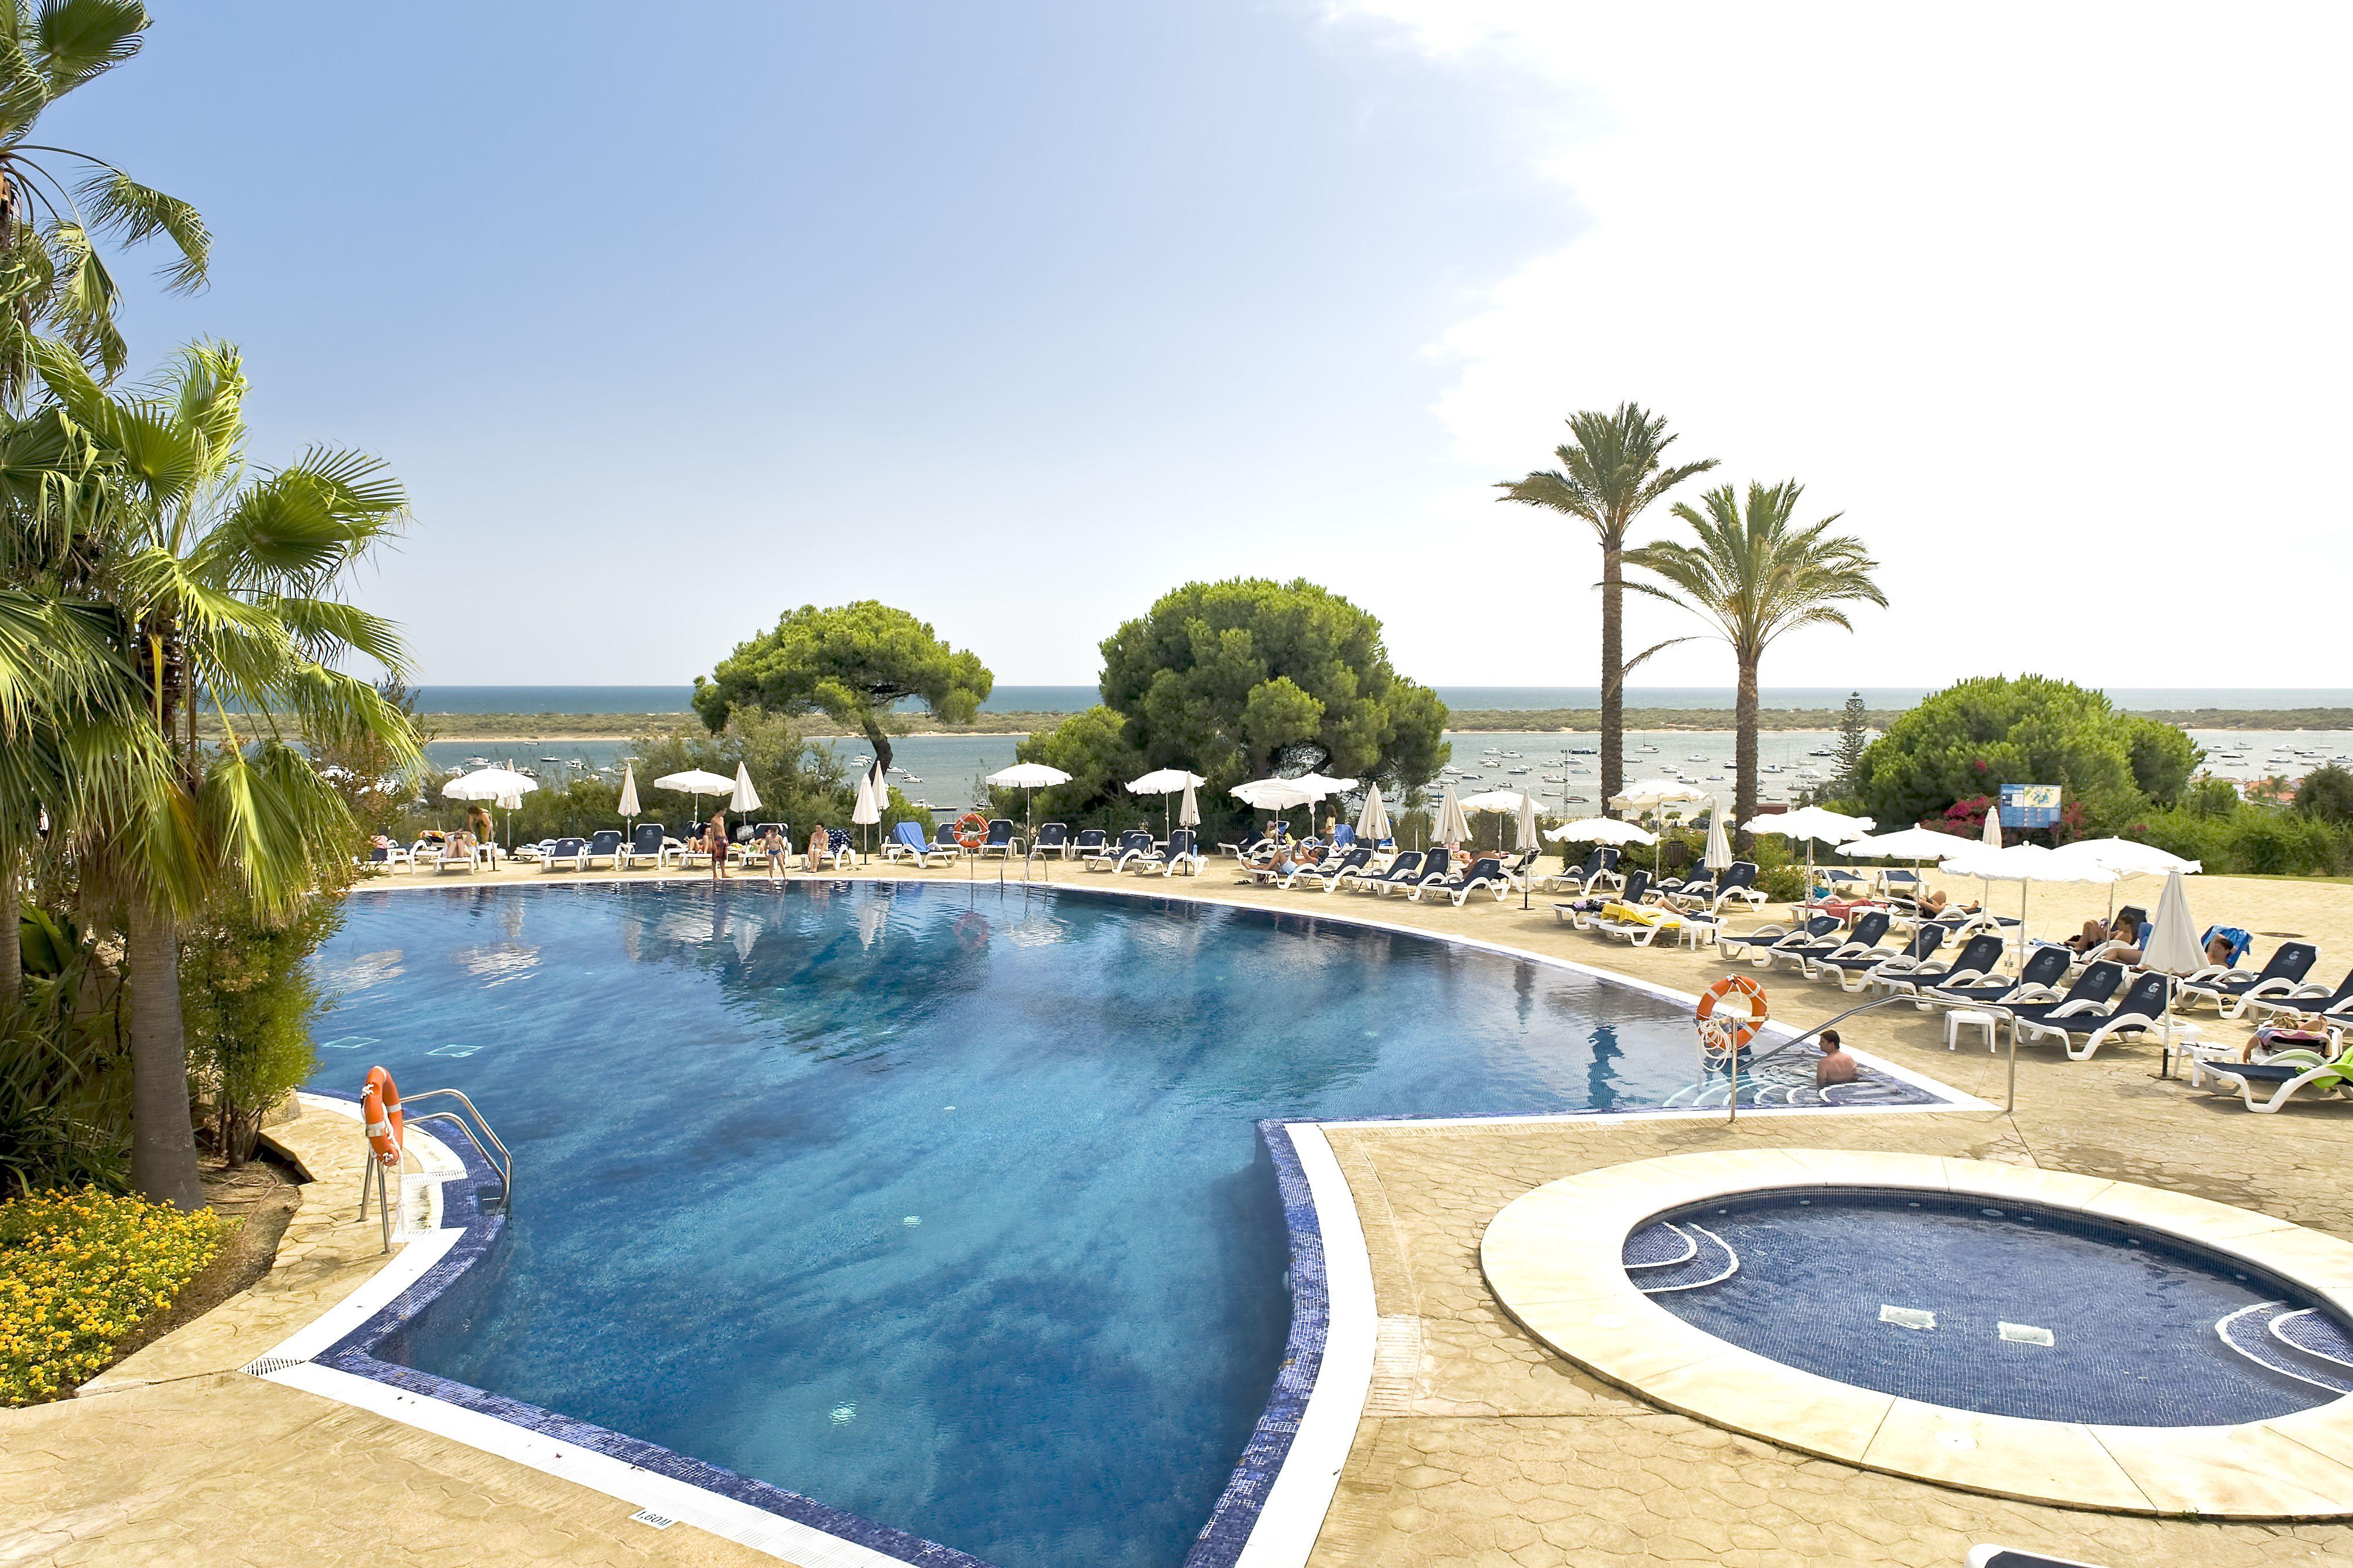 Garden Playanatural Hotel Spa Gardenhotels Andalucía Huelva Adultsonly Hotel Hoteles Romper